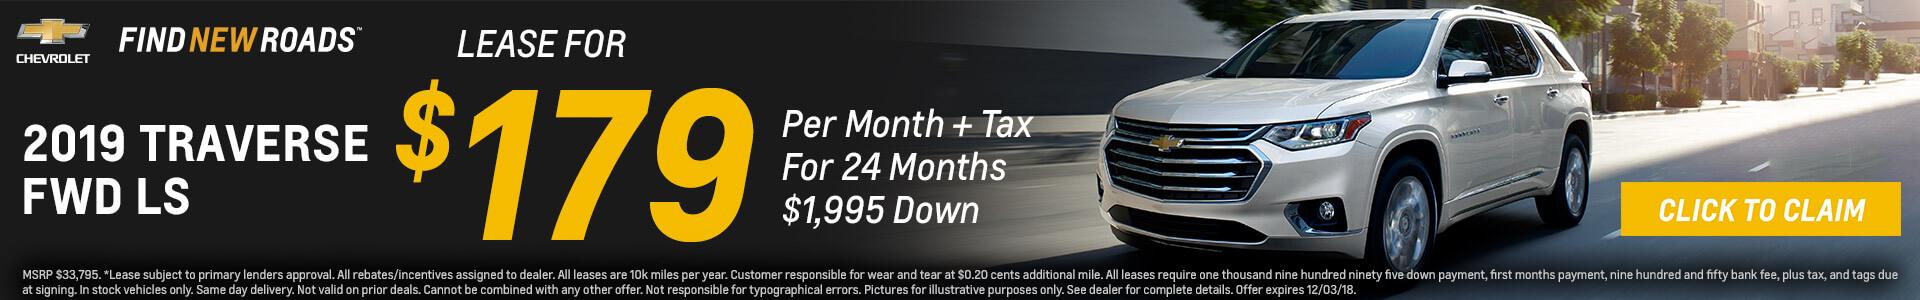 Chevrolet Traverse $179 Lease